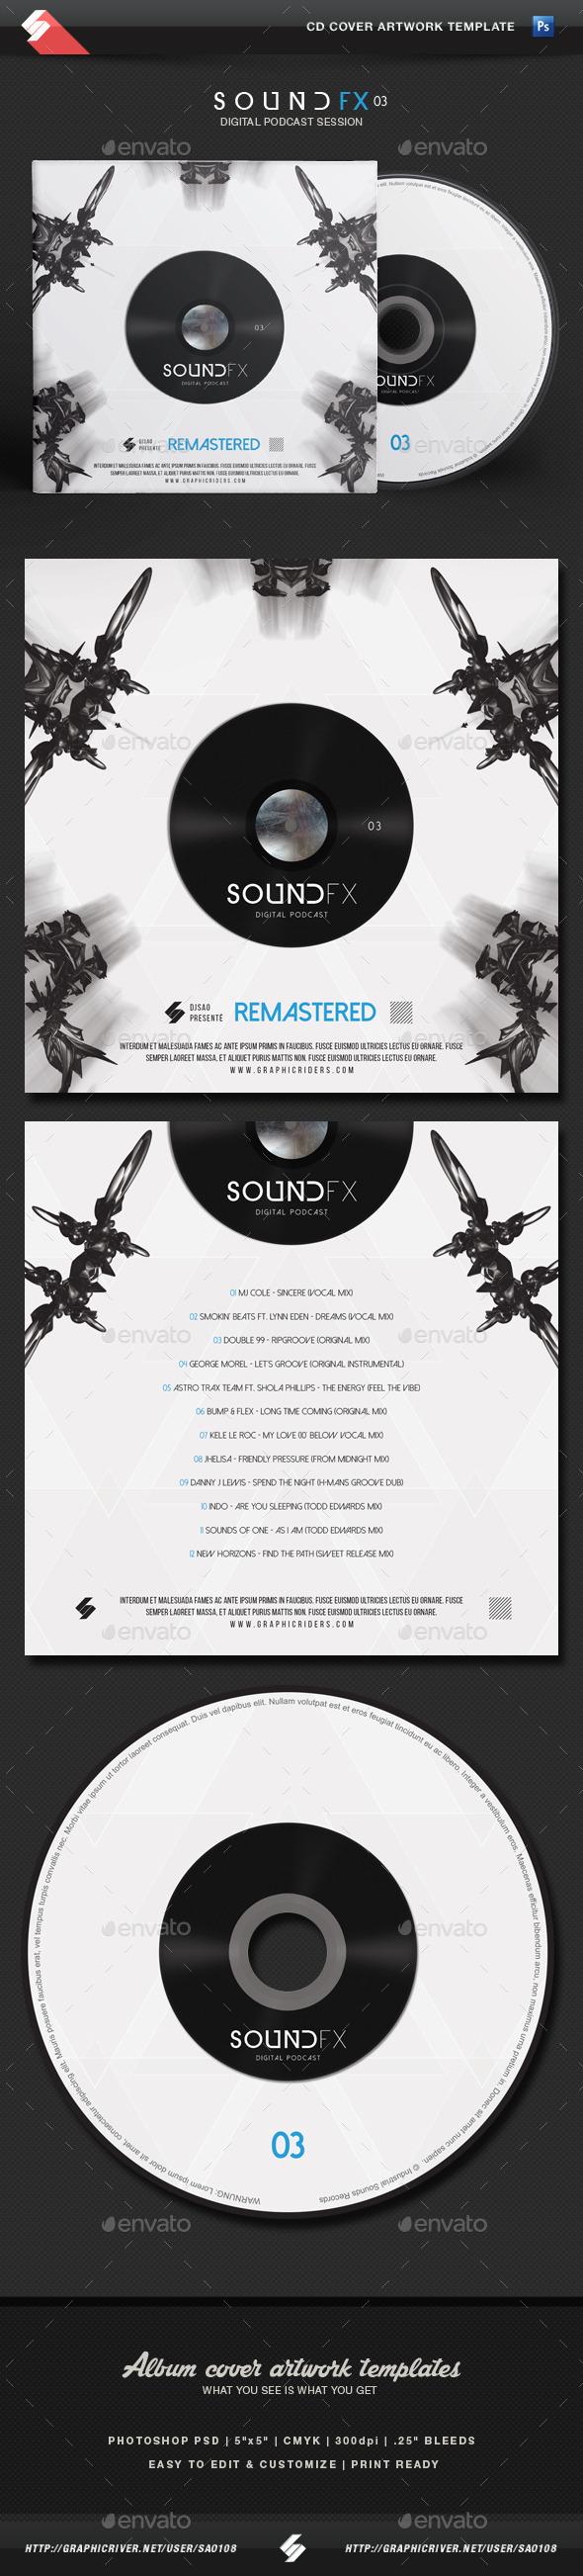 GraphicRiver Sound FX vol.3 CD Cover Artwork Template 11768360